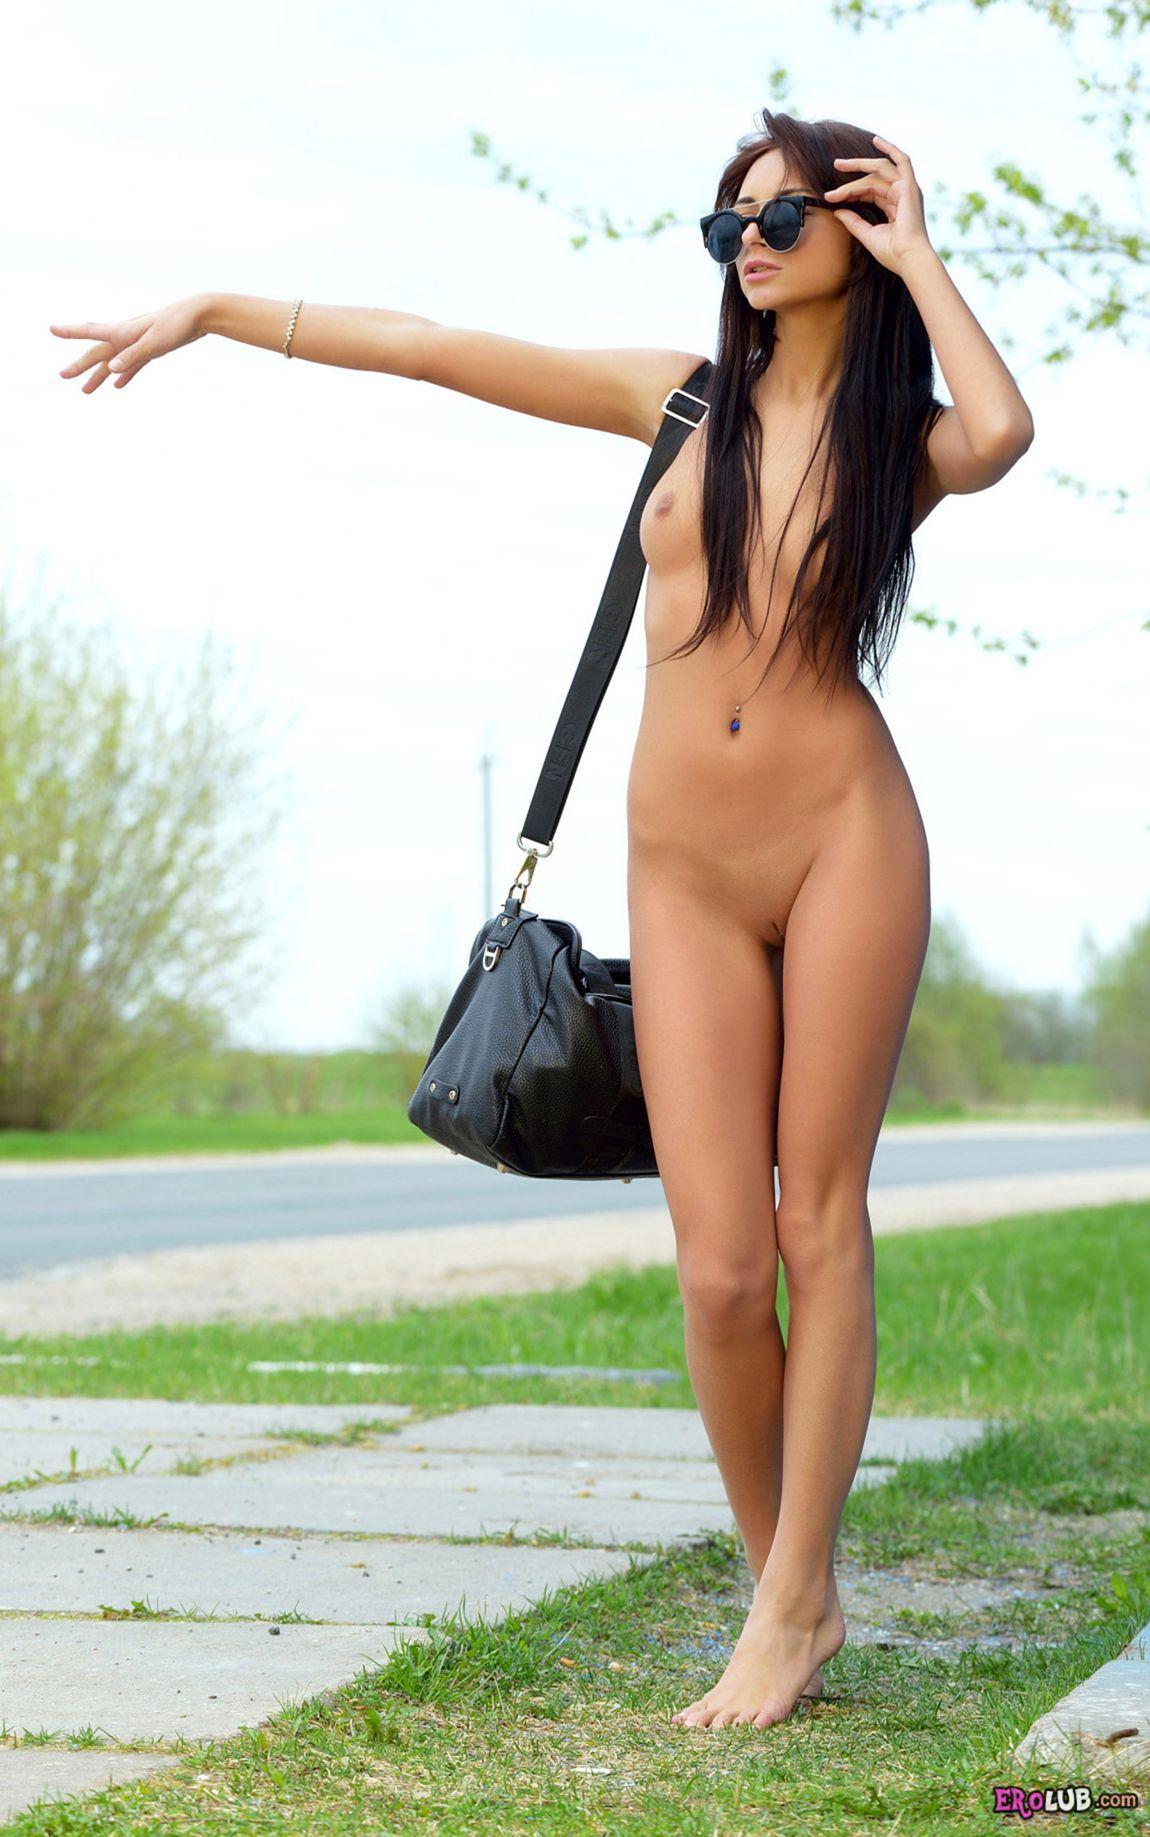 Голые девушки автостопом фото 763-733